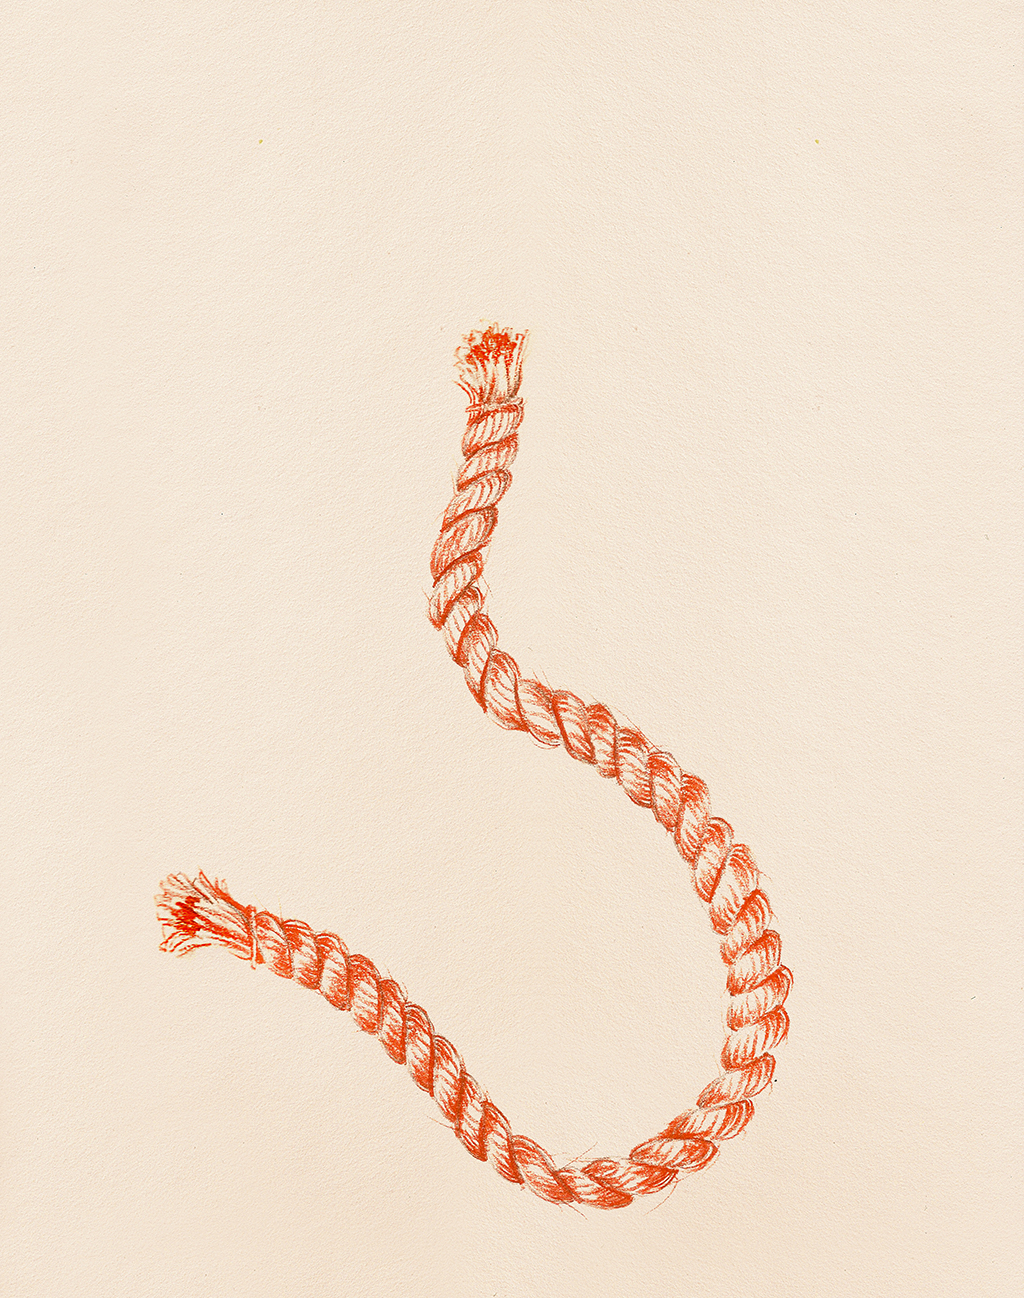 Rope#34